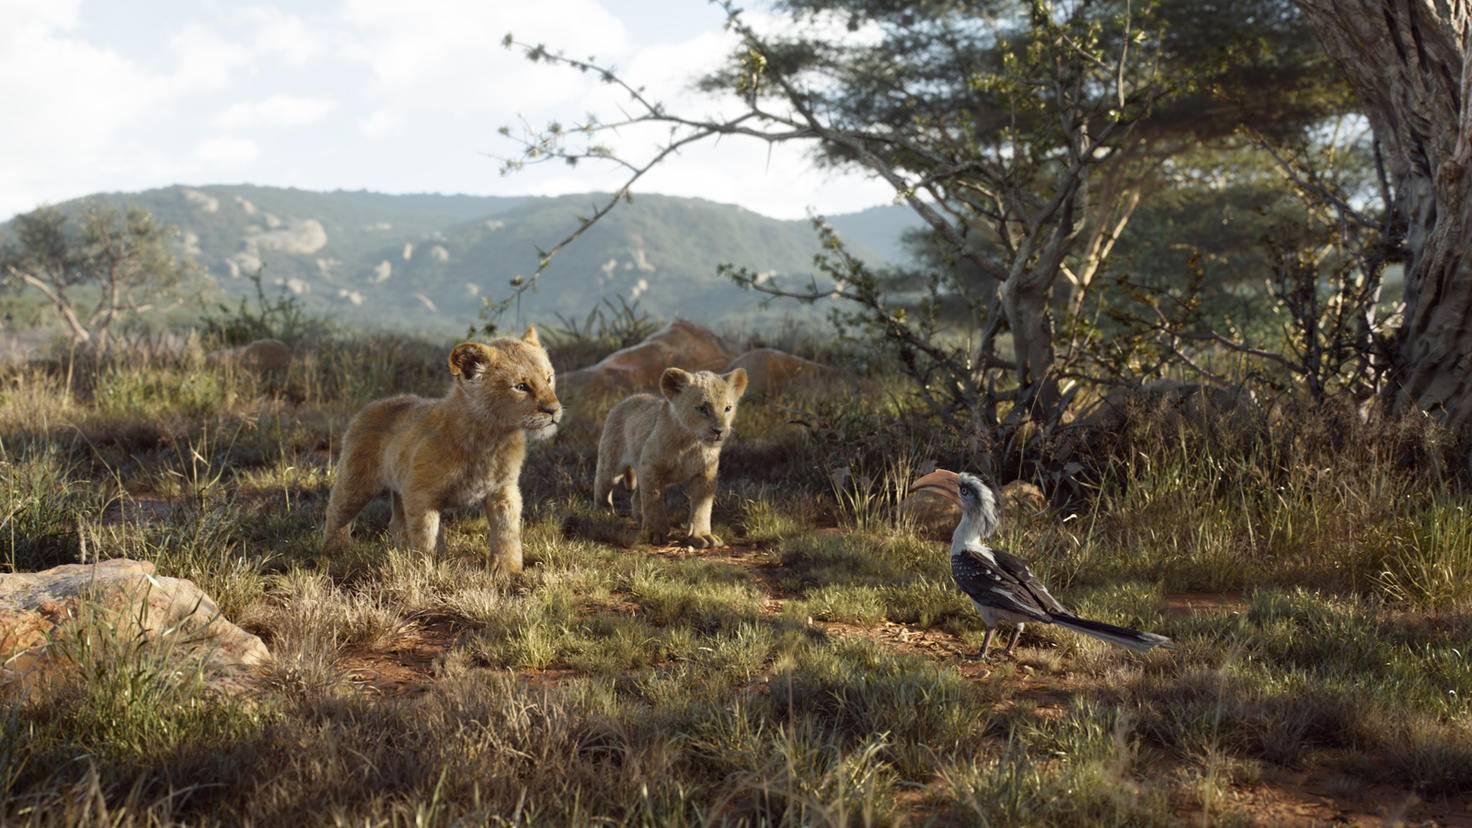 Zazu accompanies the two lion children everywhere.